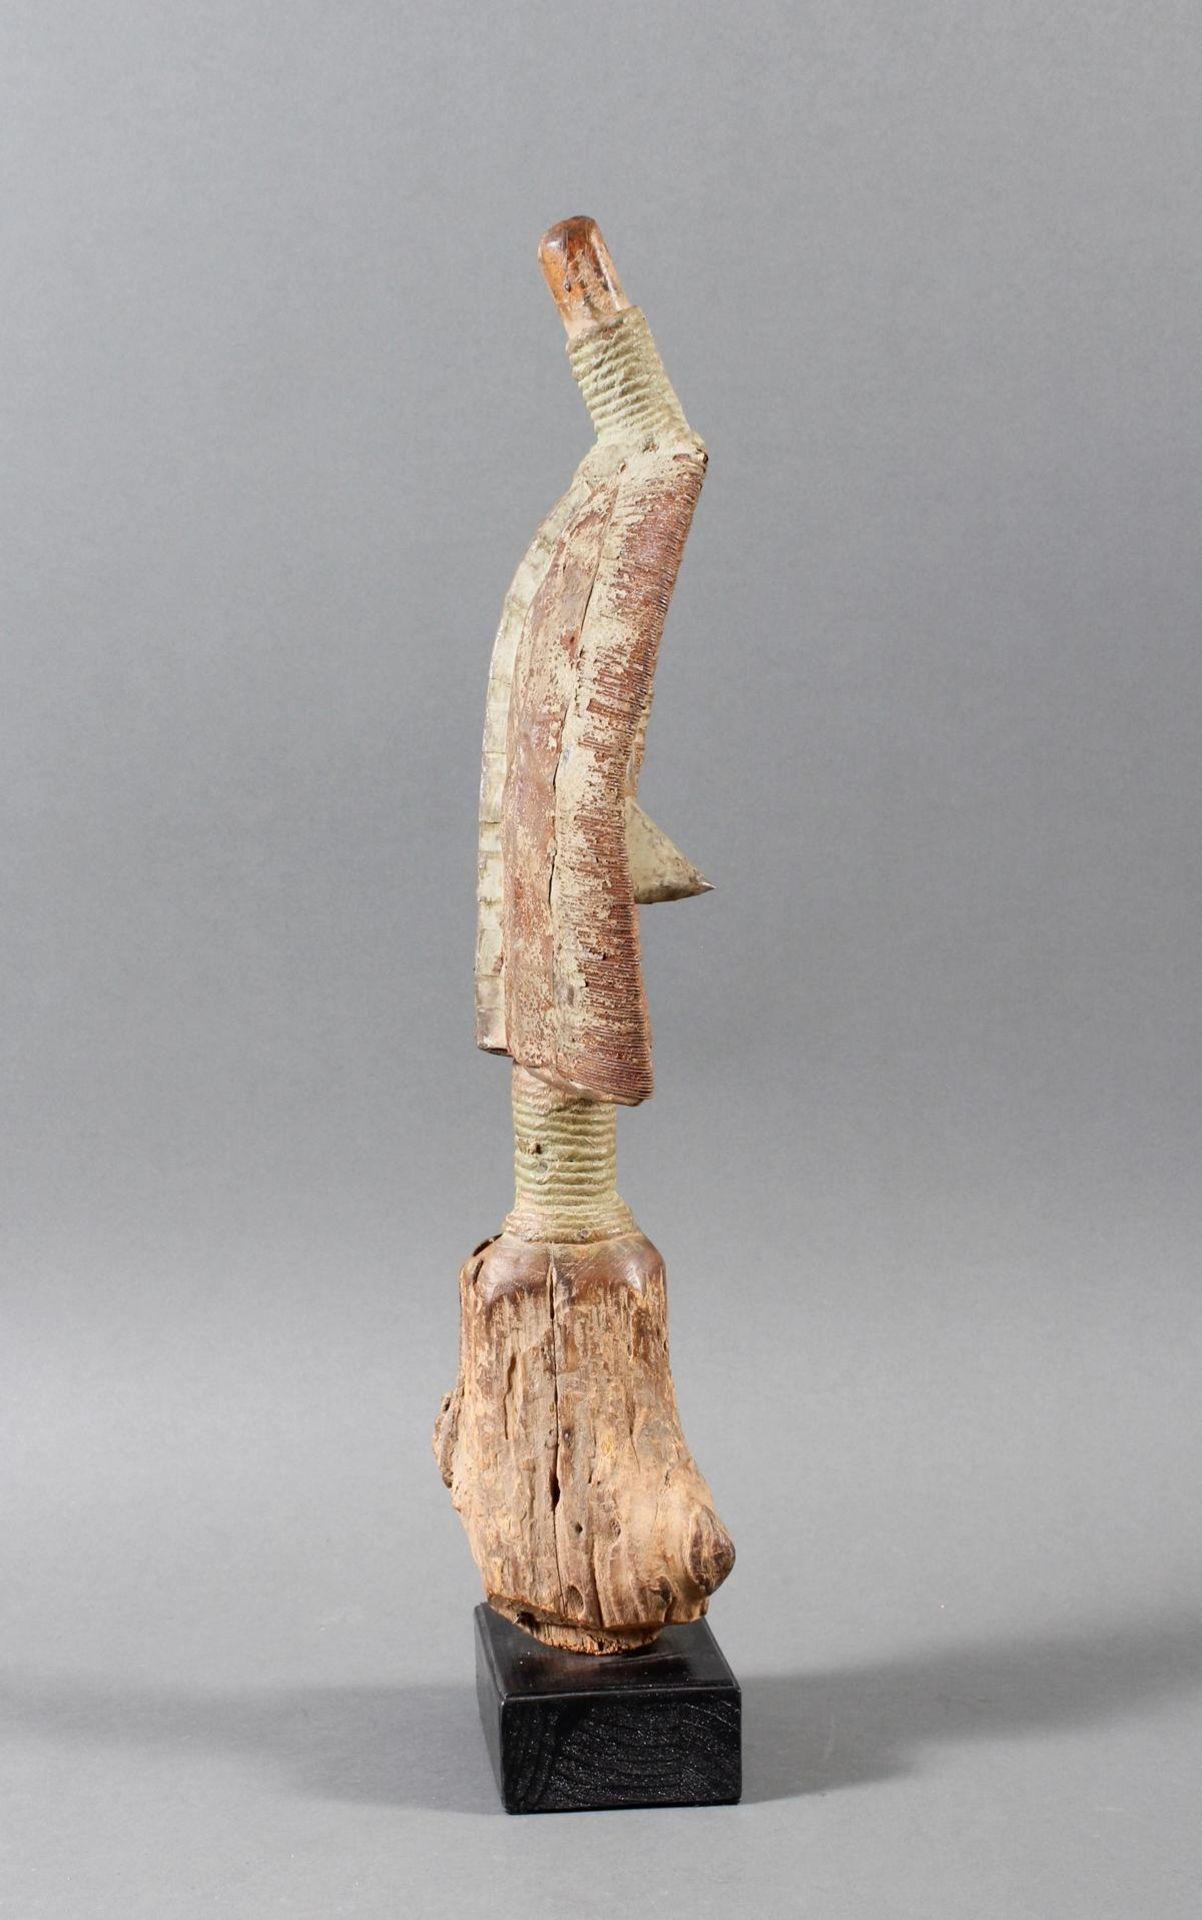 Grabwächter, Reliquiarfigur, Mahongwe / Gabun - Bild 4 aus 7